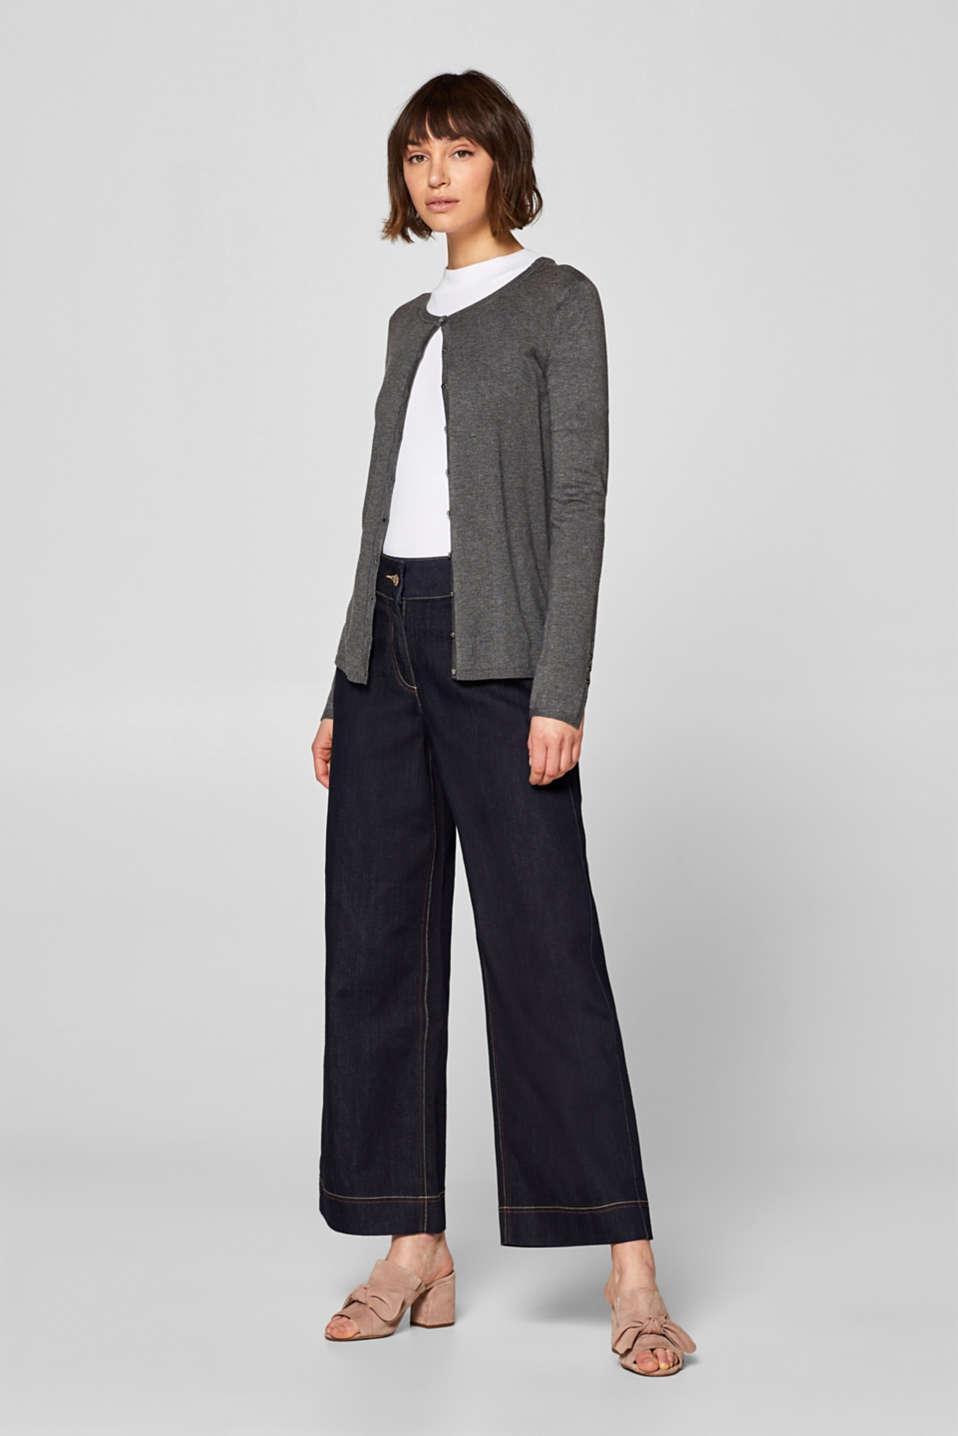 Fine knit cardigan with a round neckline, GUNMETAL 5, detail image number 1